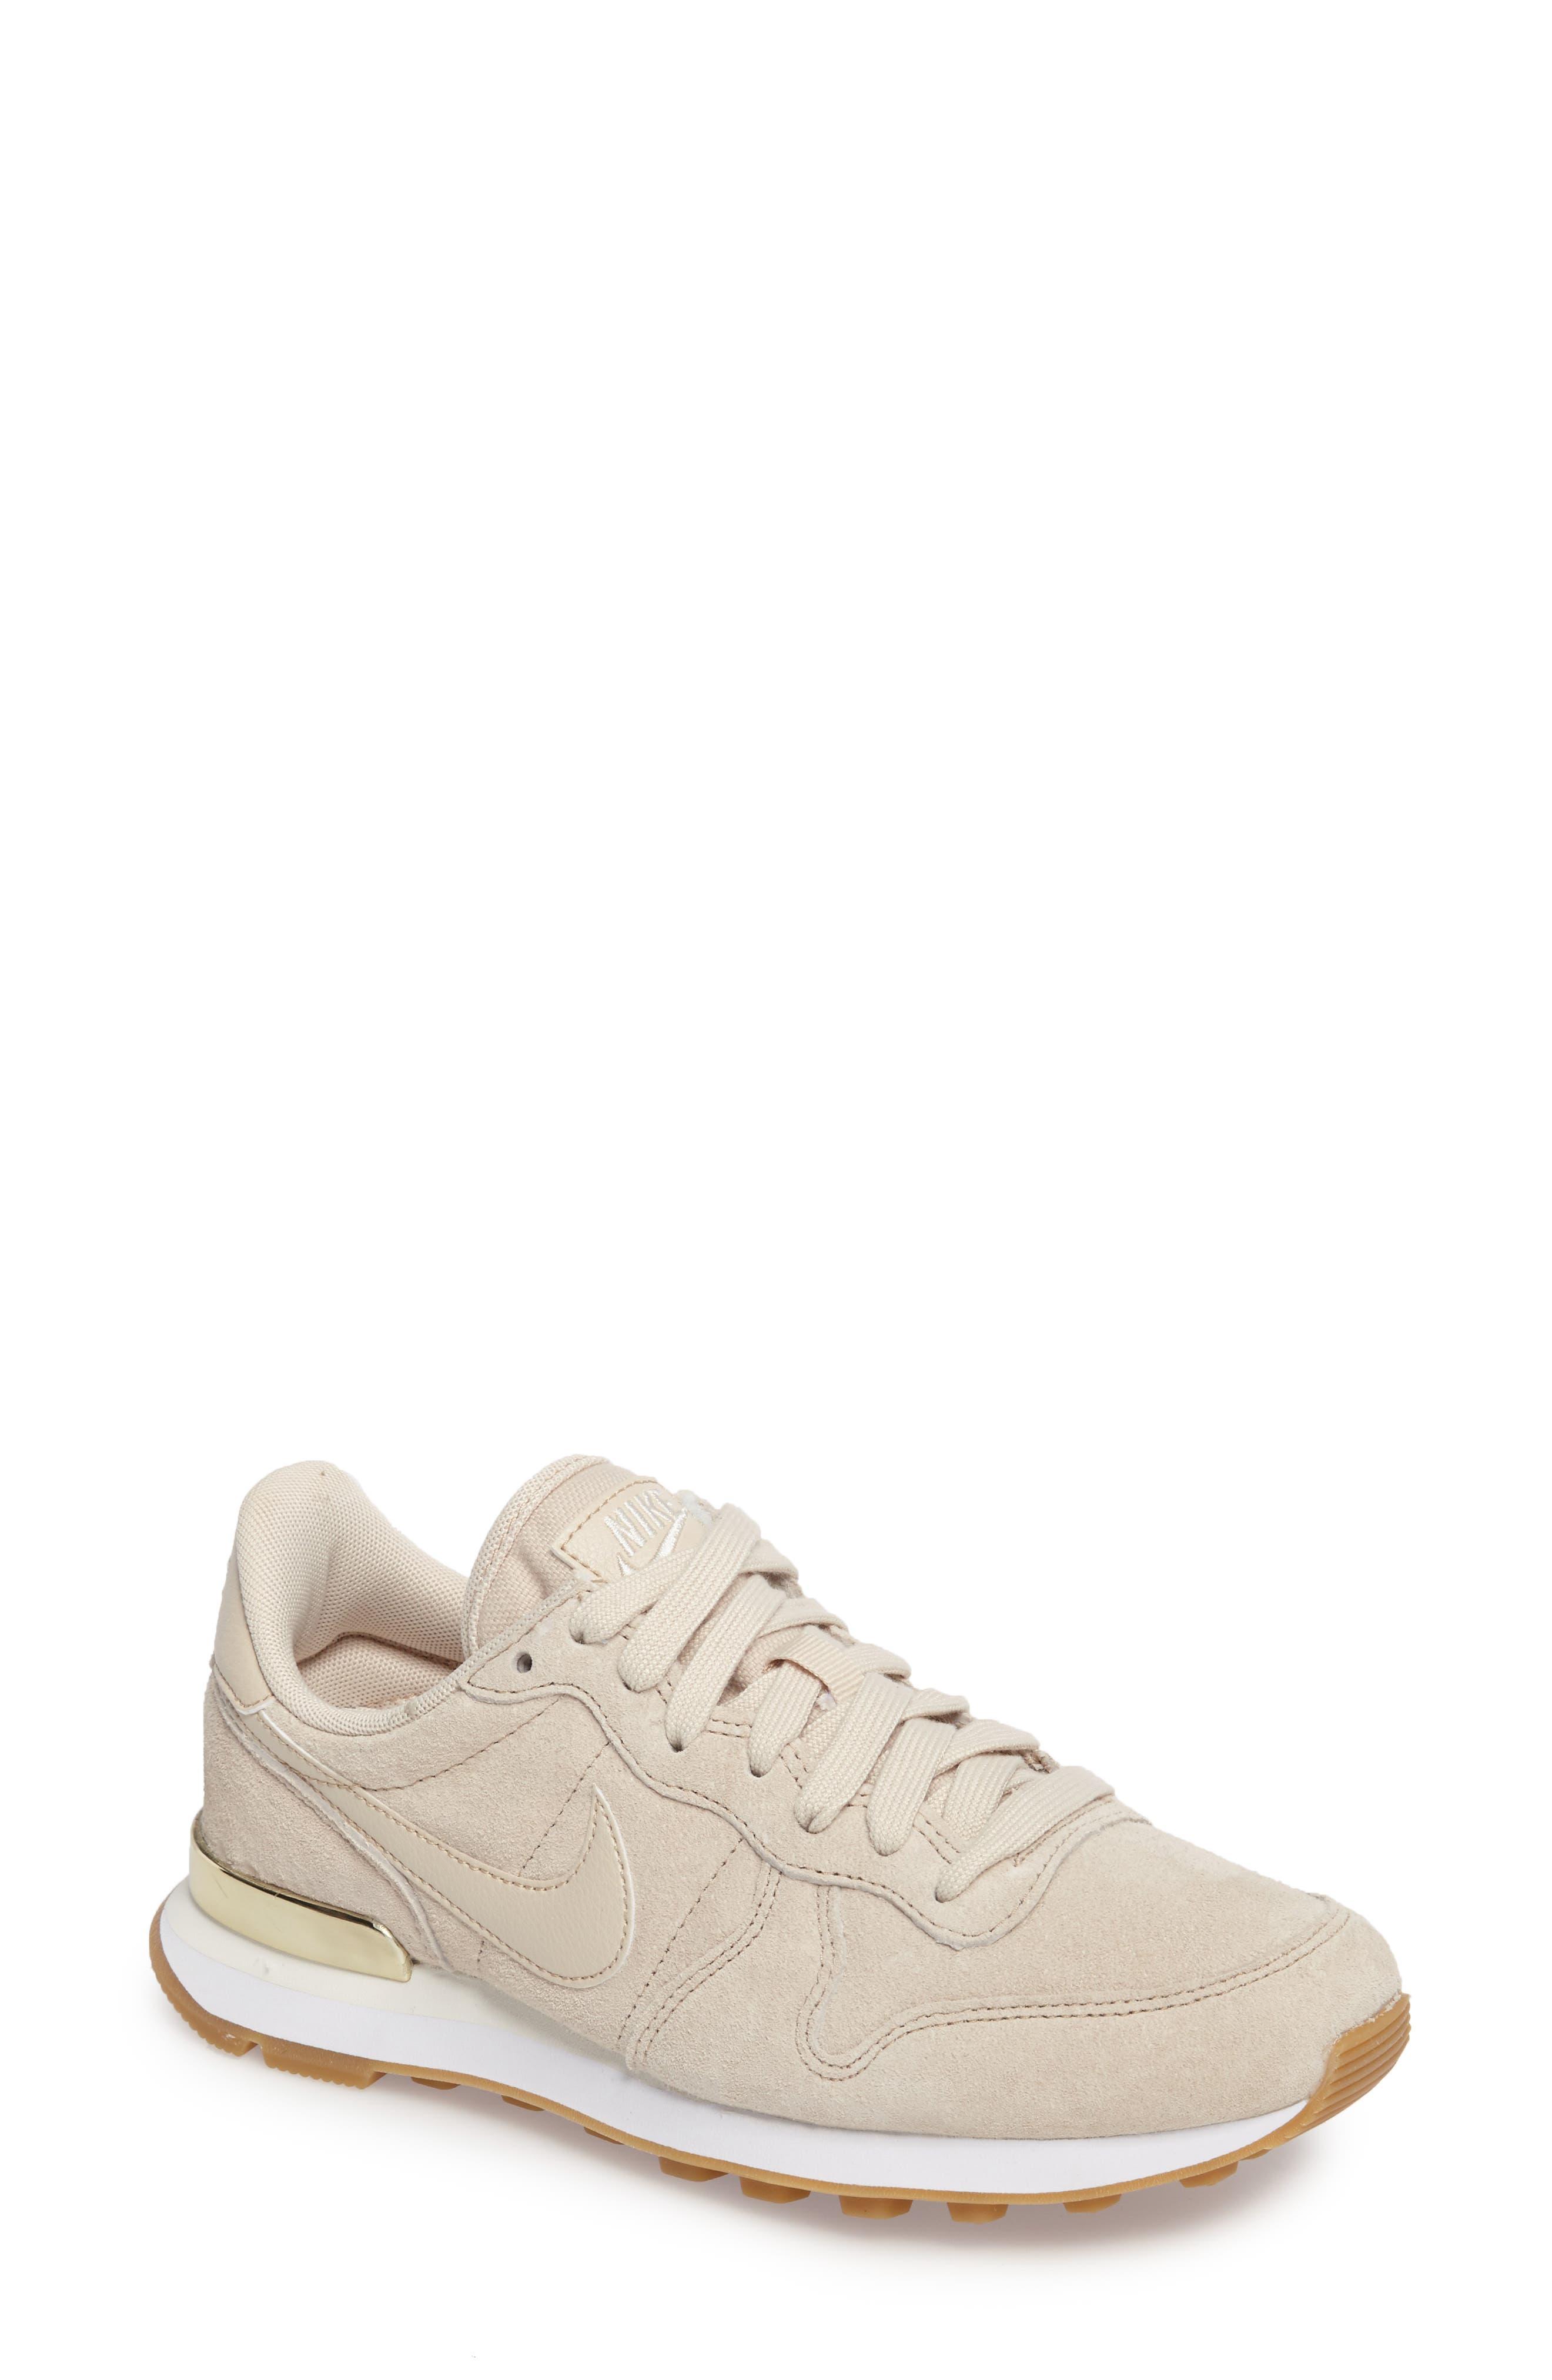 Internationalist SD Sneaker,                             Main thumbnail 1, color,                             250